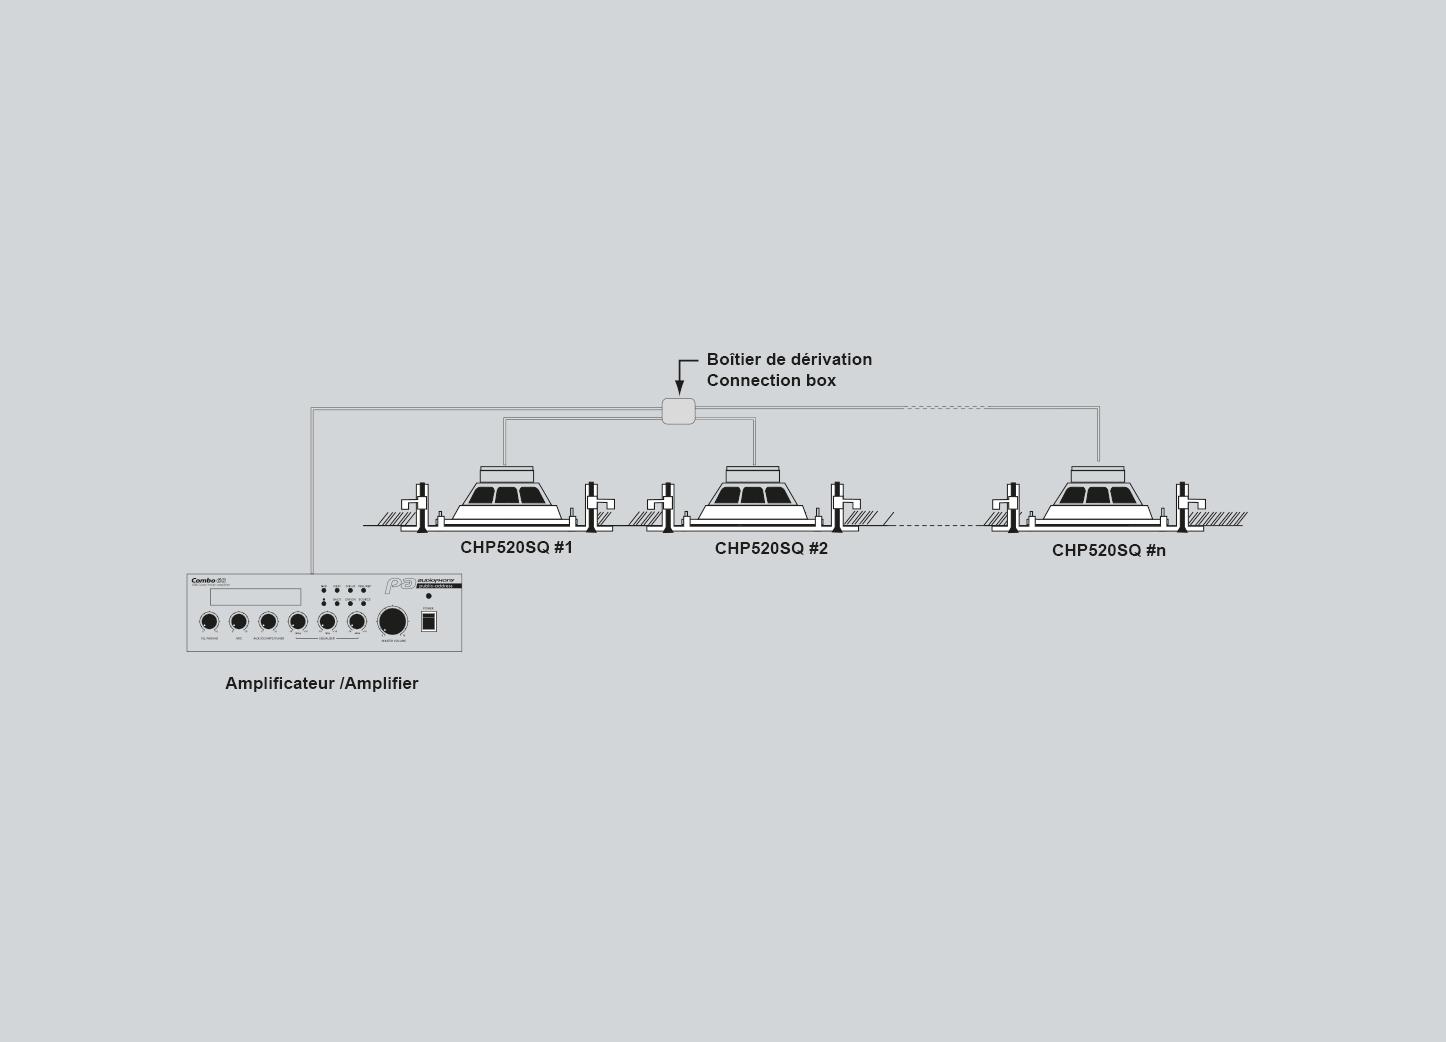 CHP520SQ installation